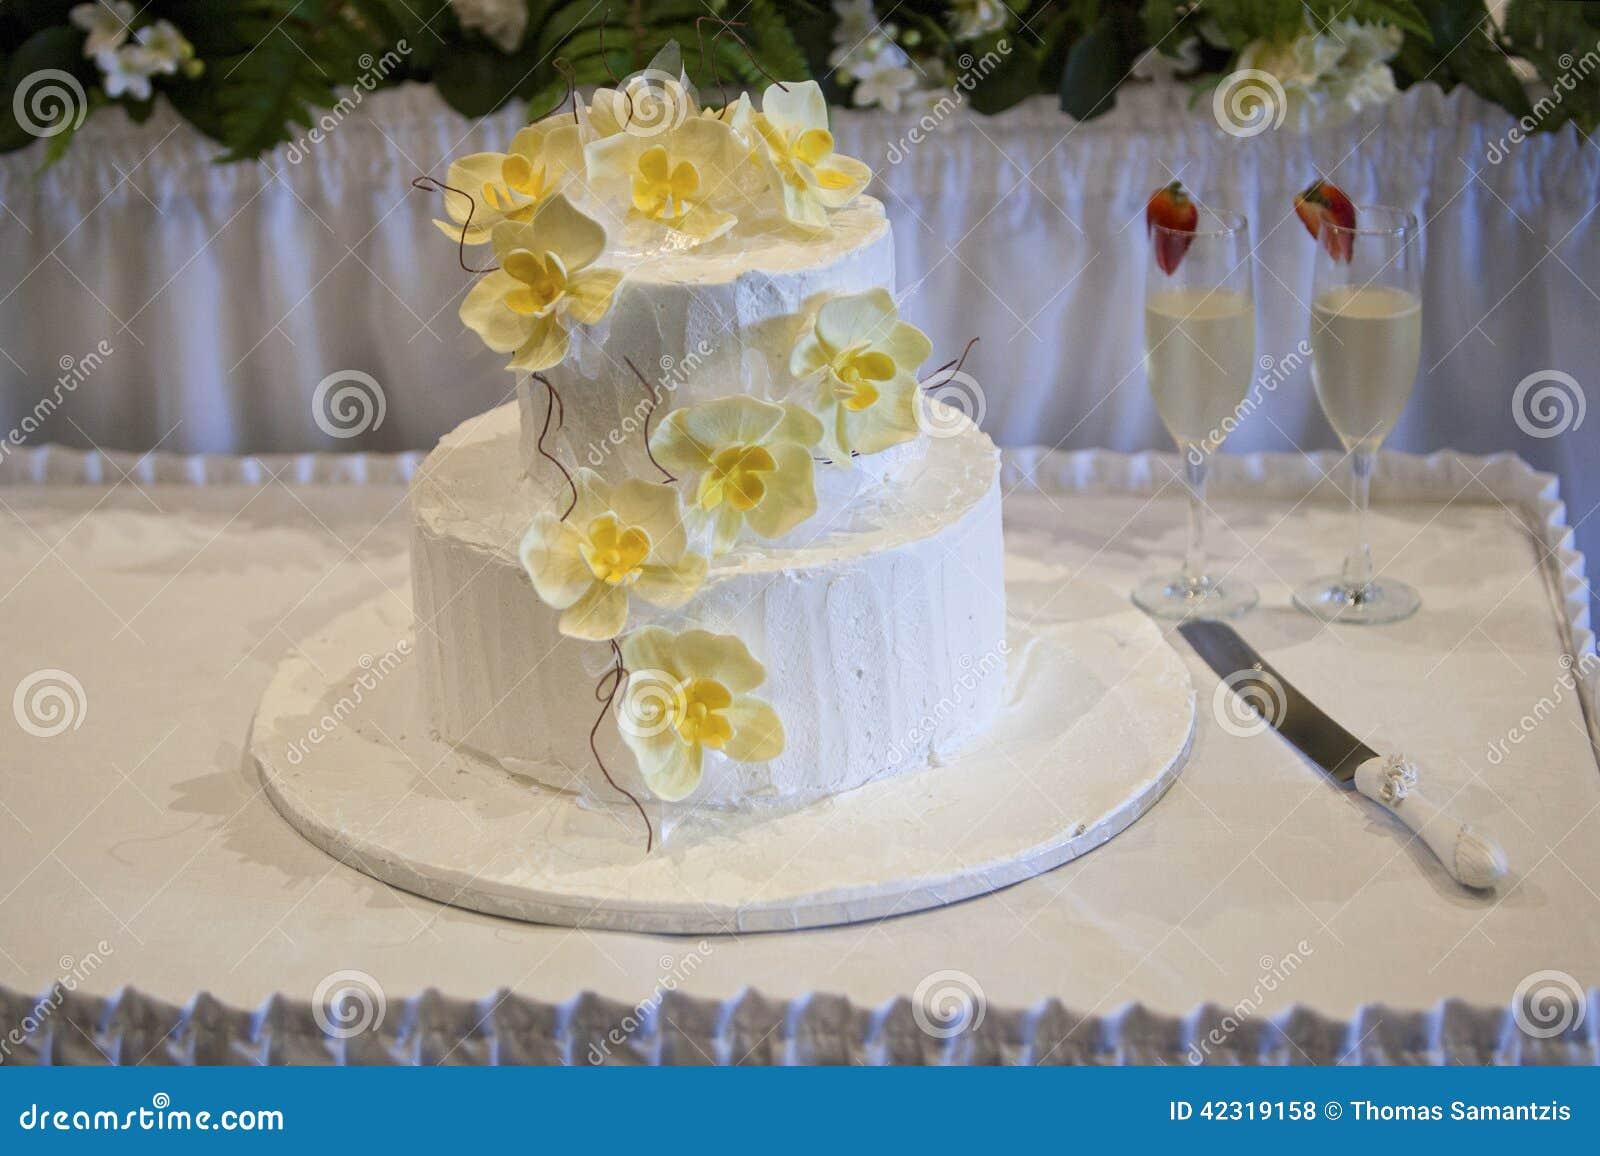 Wedding cake with yellow flowers stock photo image of sugar food wedding cake with yellow orchid flowers royalty free stock photos mightylinksfo